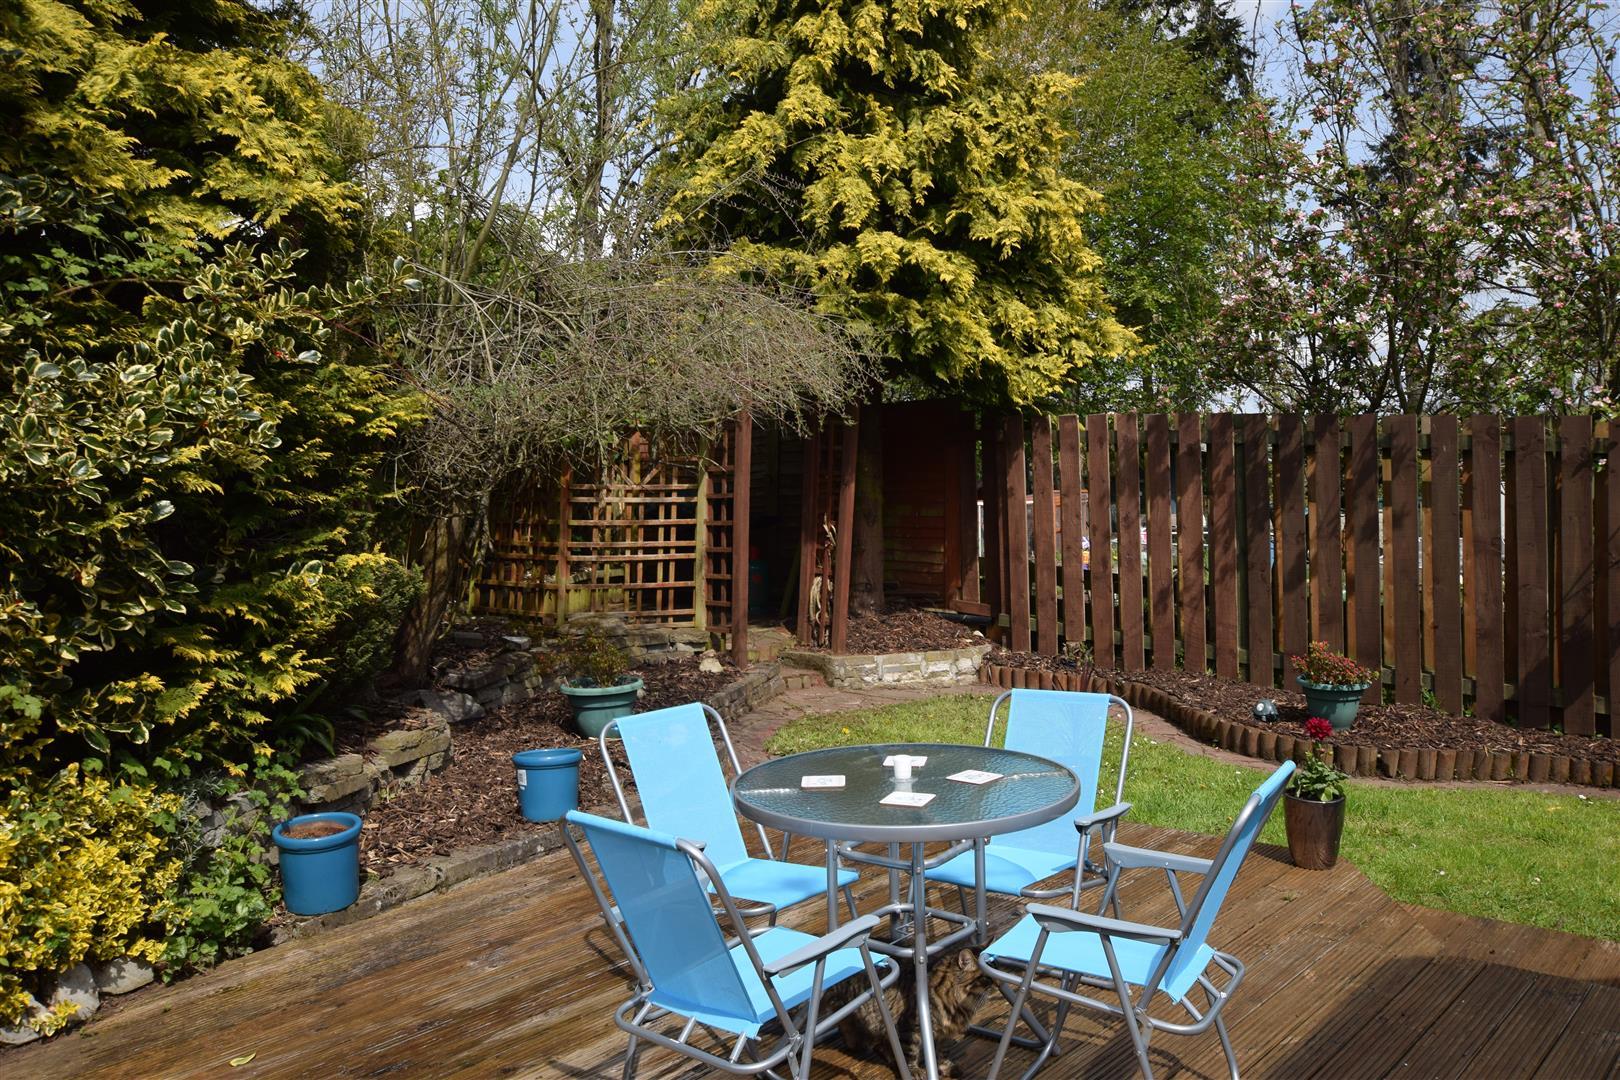 9, Marshall Gardens, Luncarty, Perthshire, PH1 3YX, UK